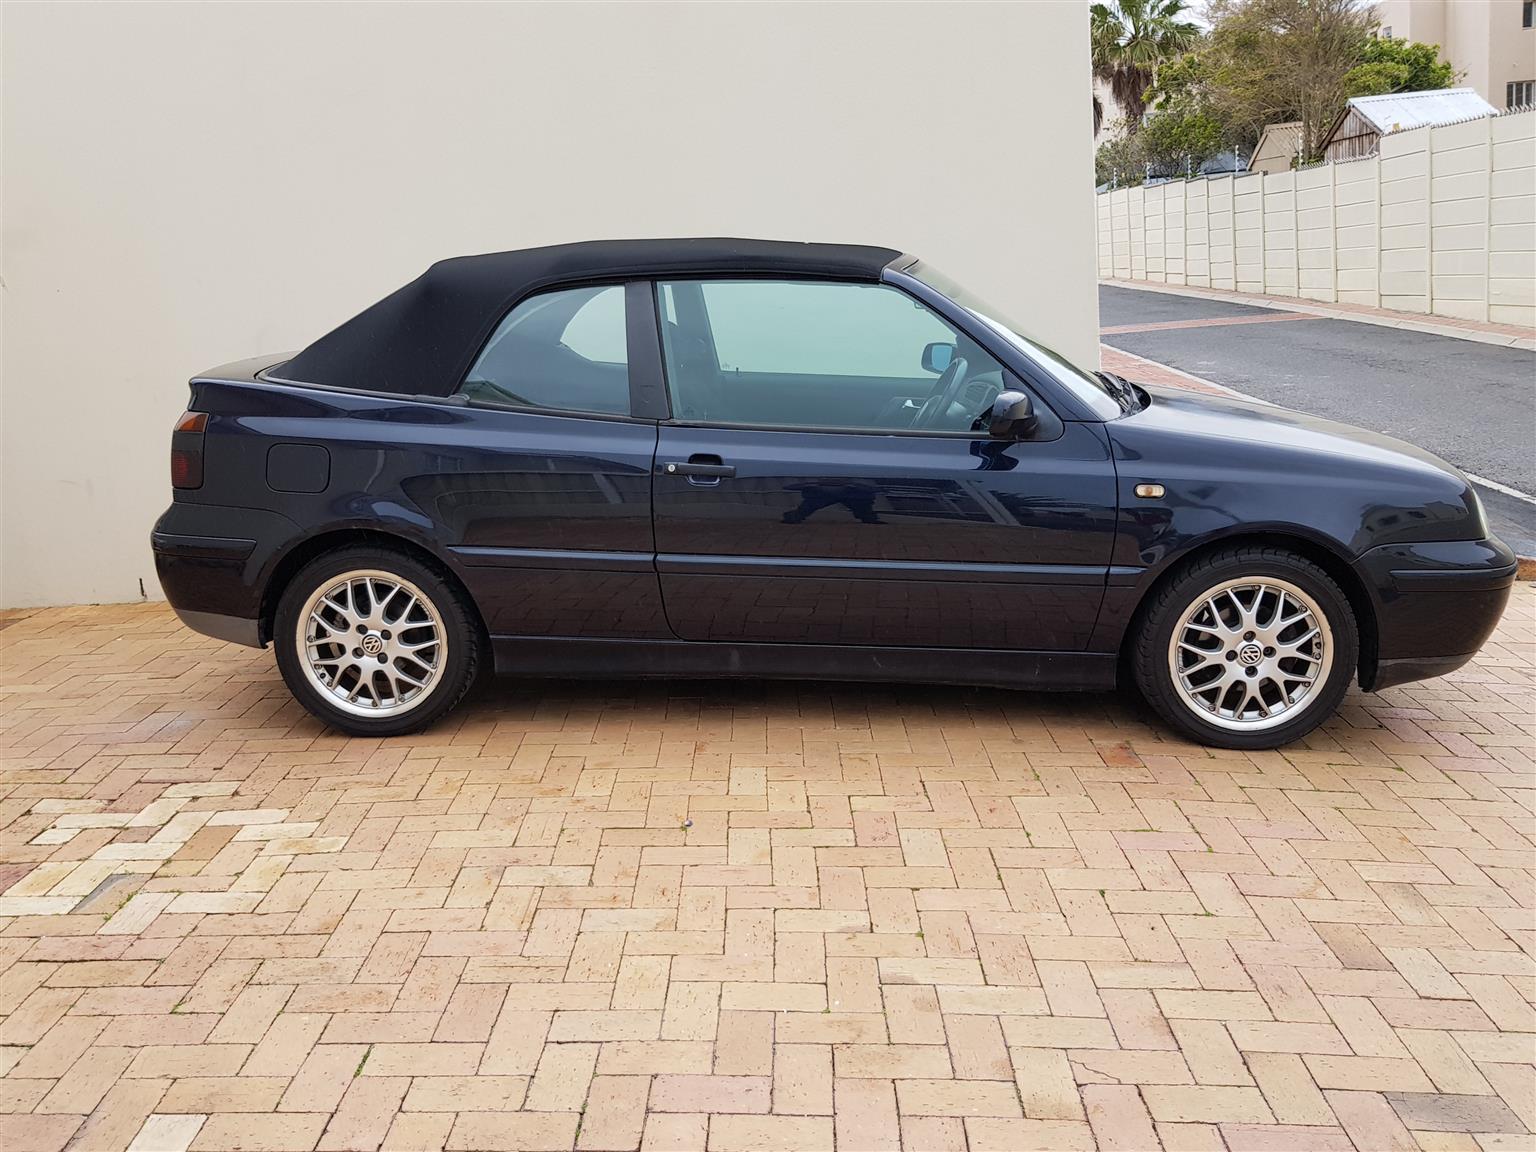 1999 VW Golf Cabriolet